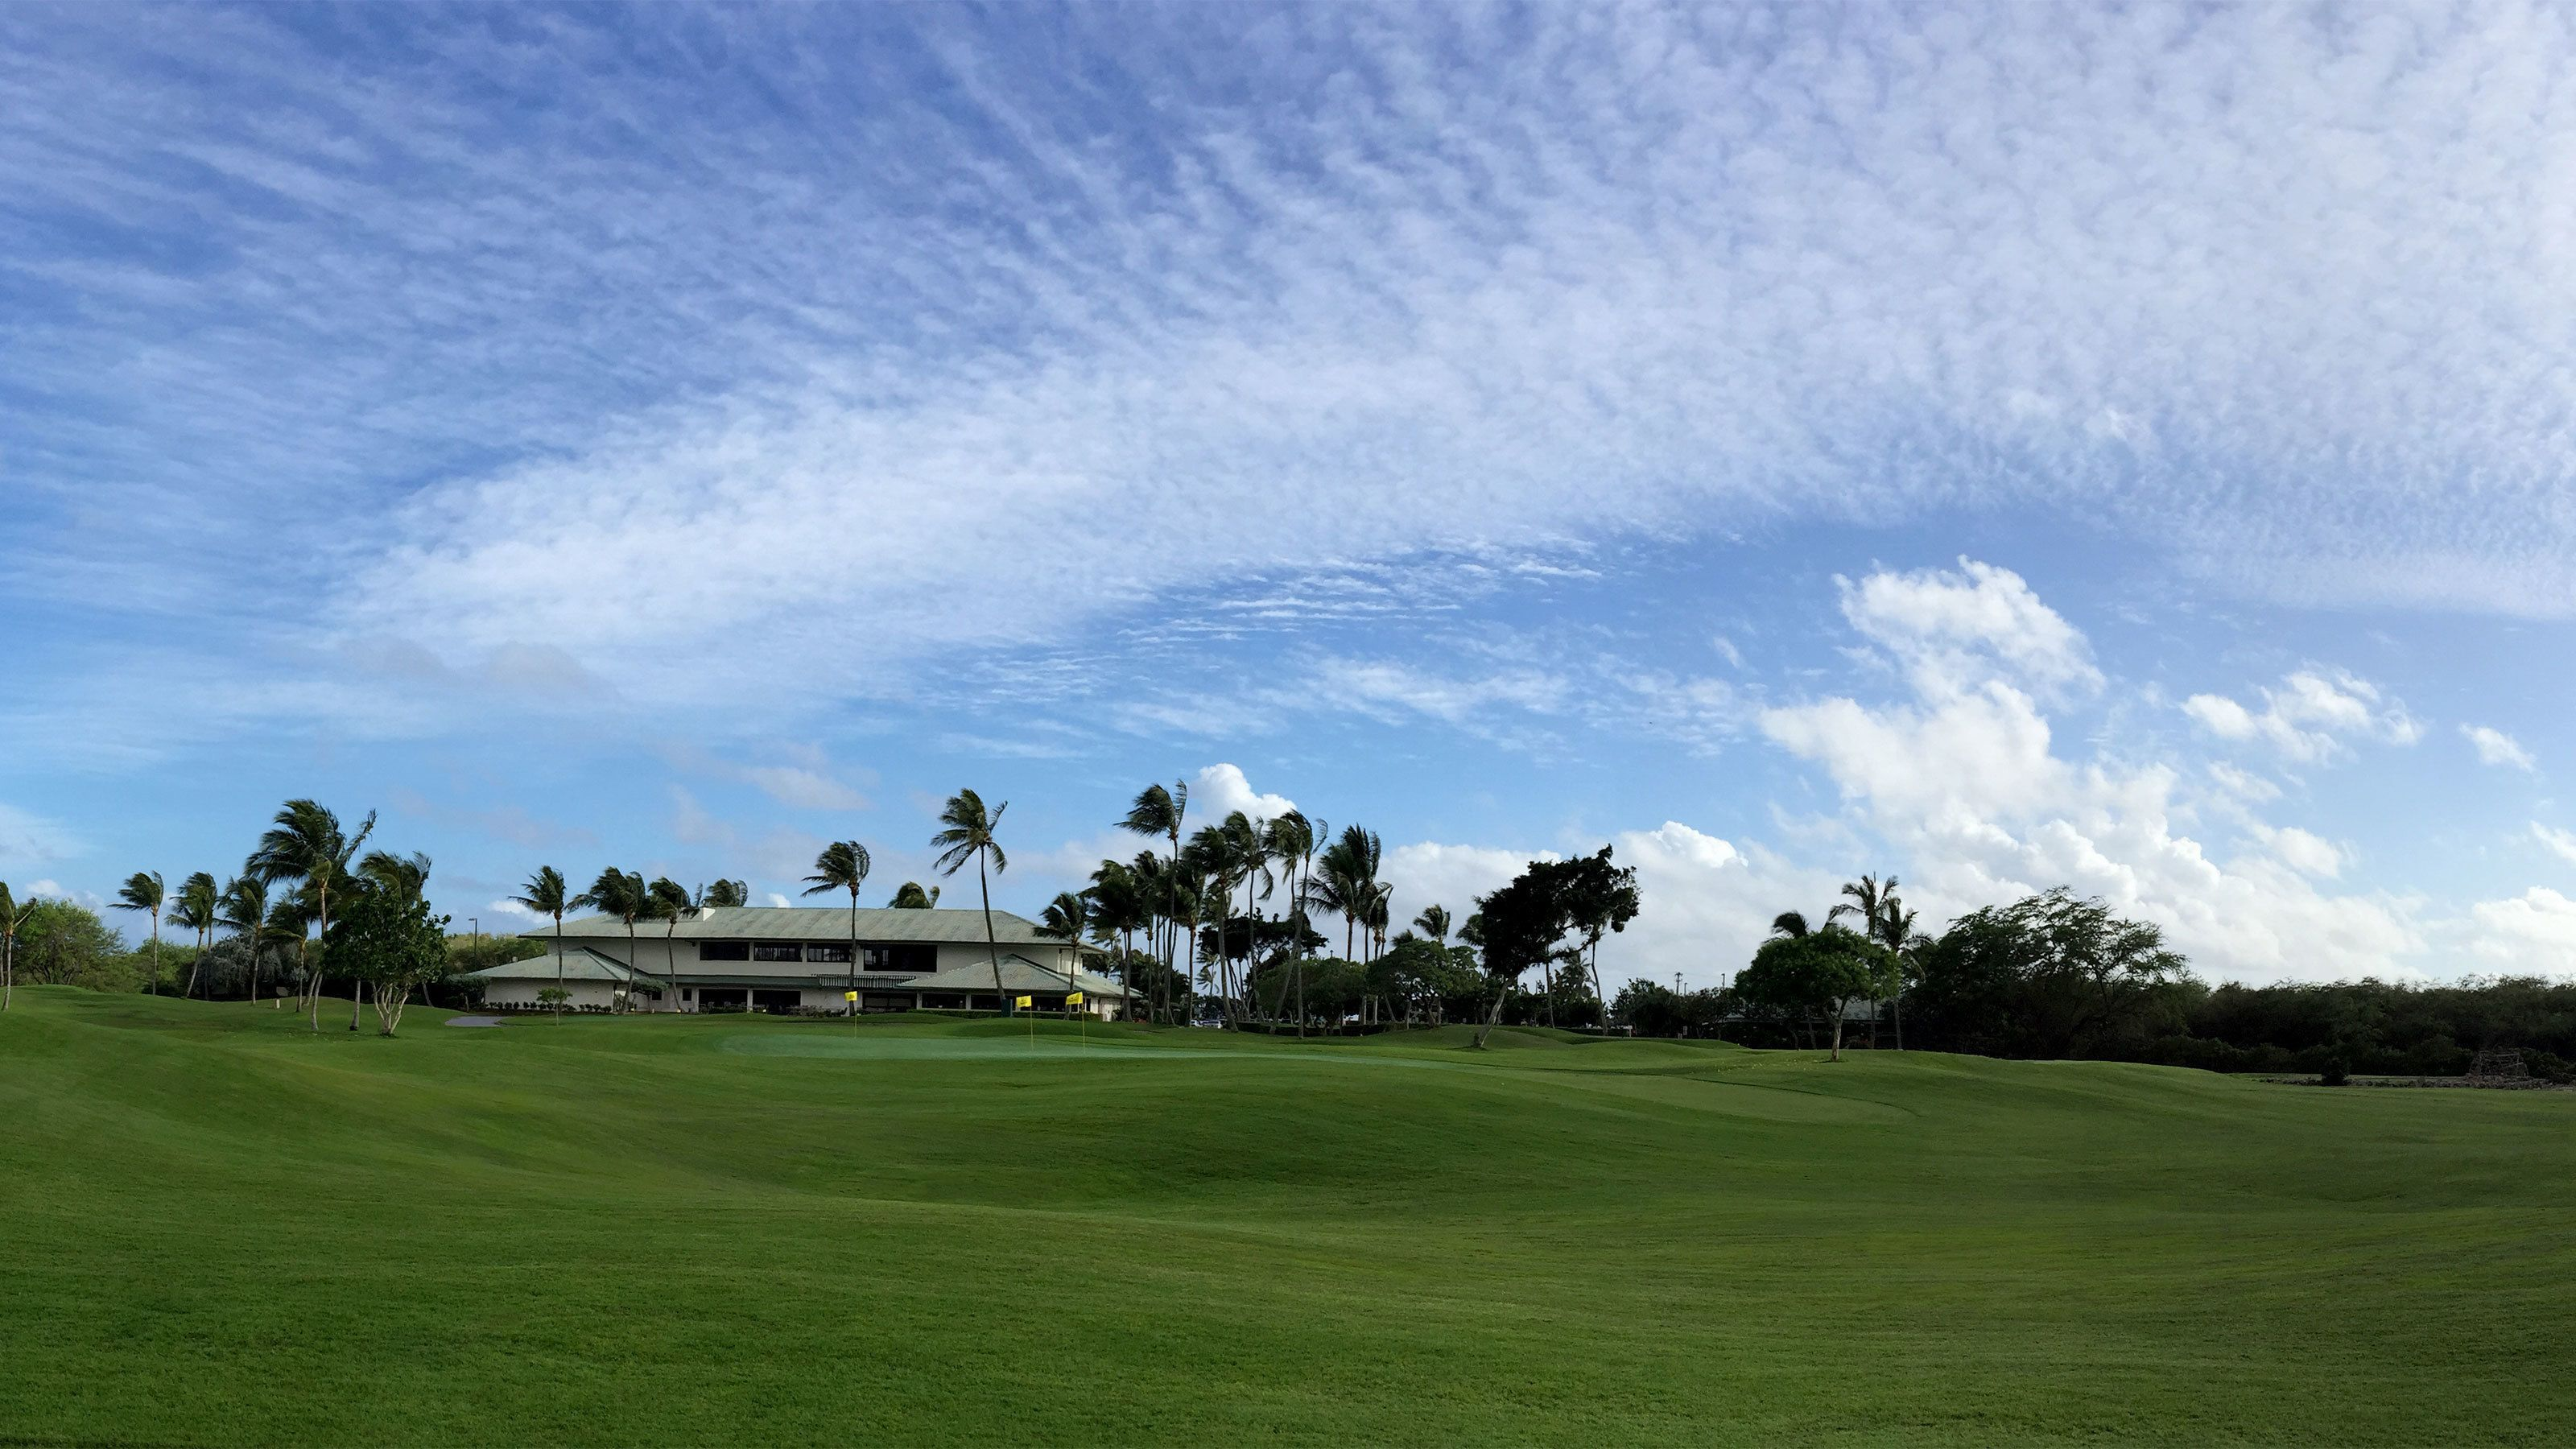 Round of Golf at Ewa Beach Golf Club